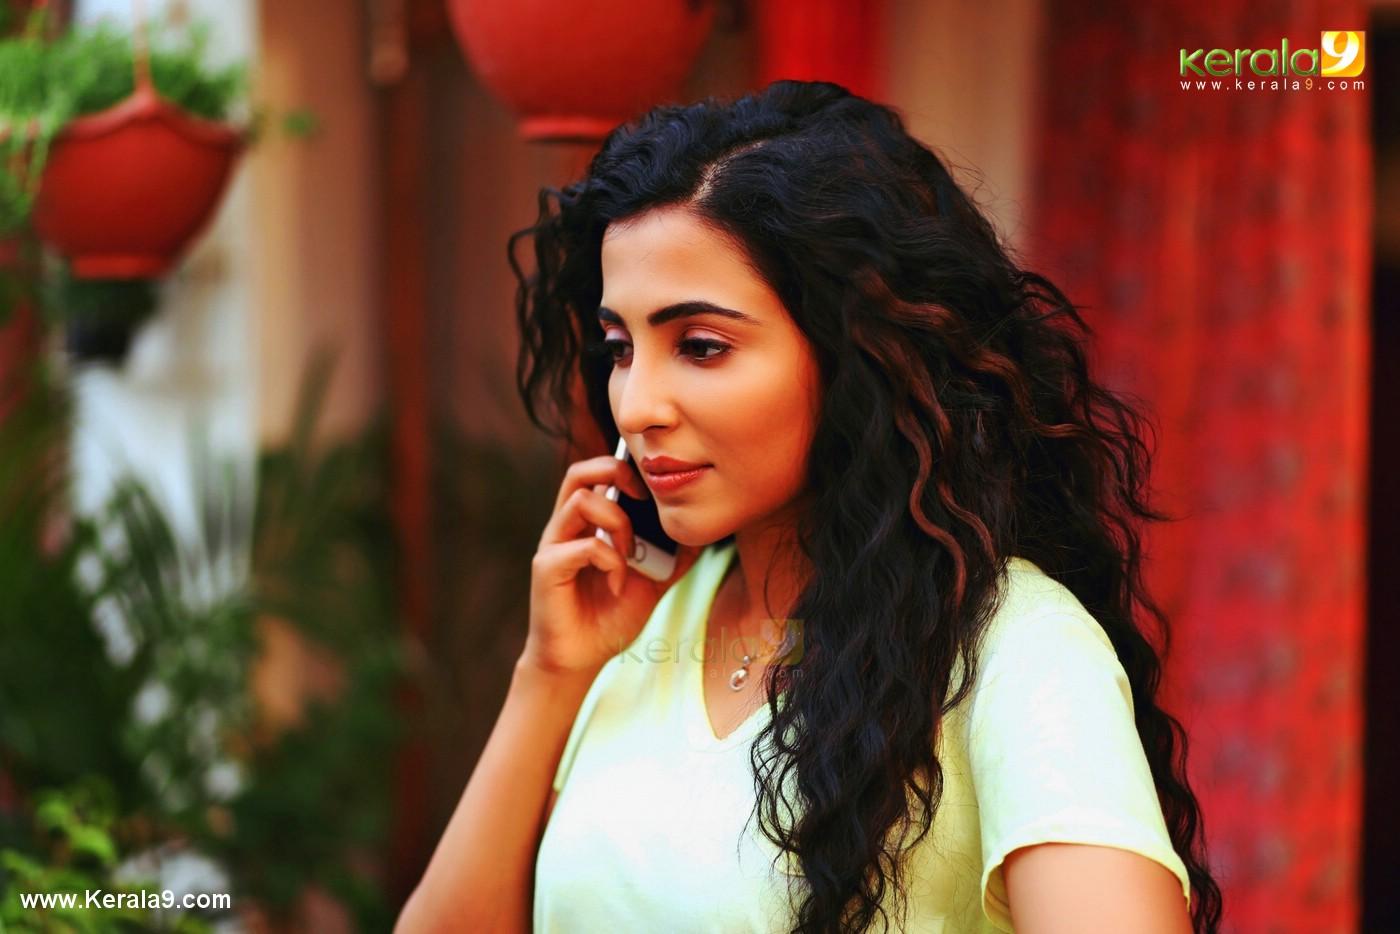 neerali malayalam movie images 0923 11